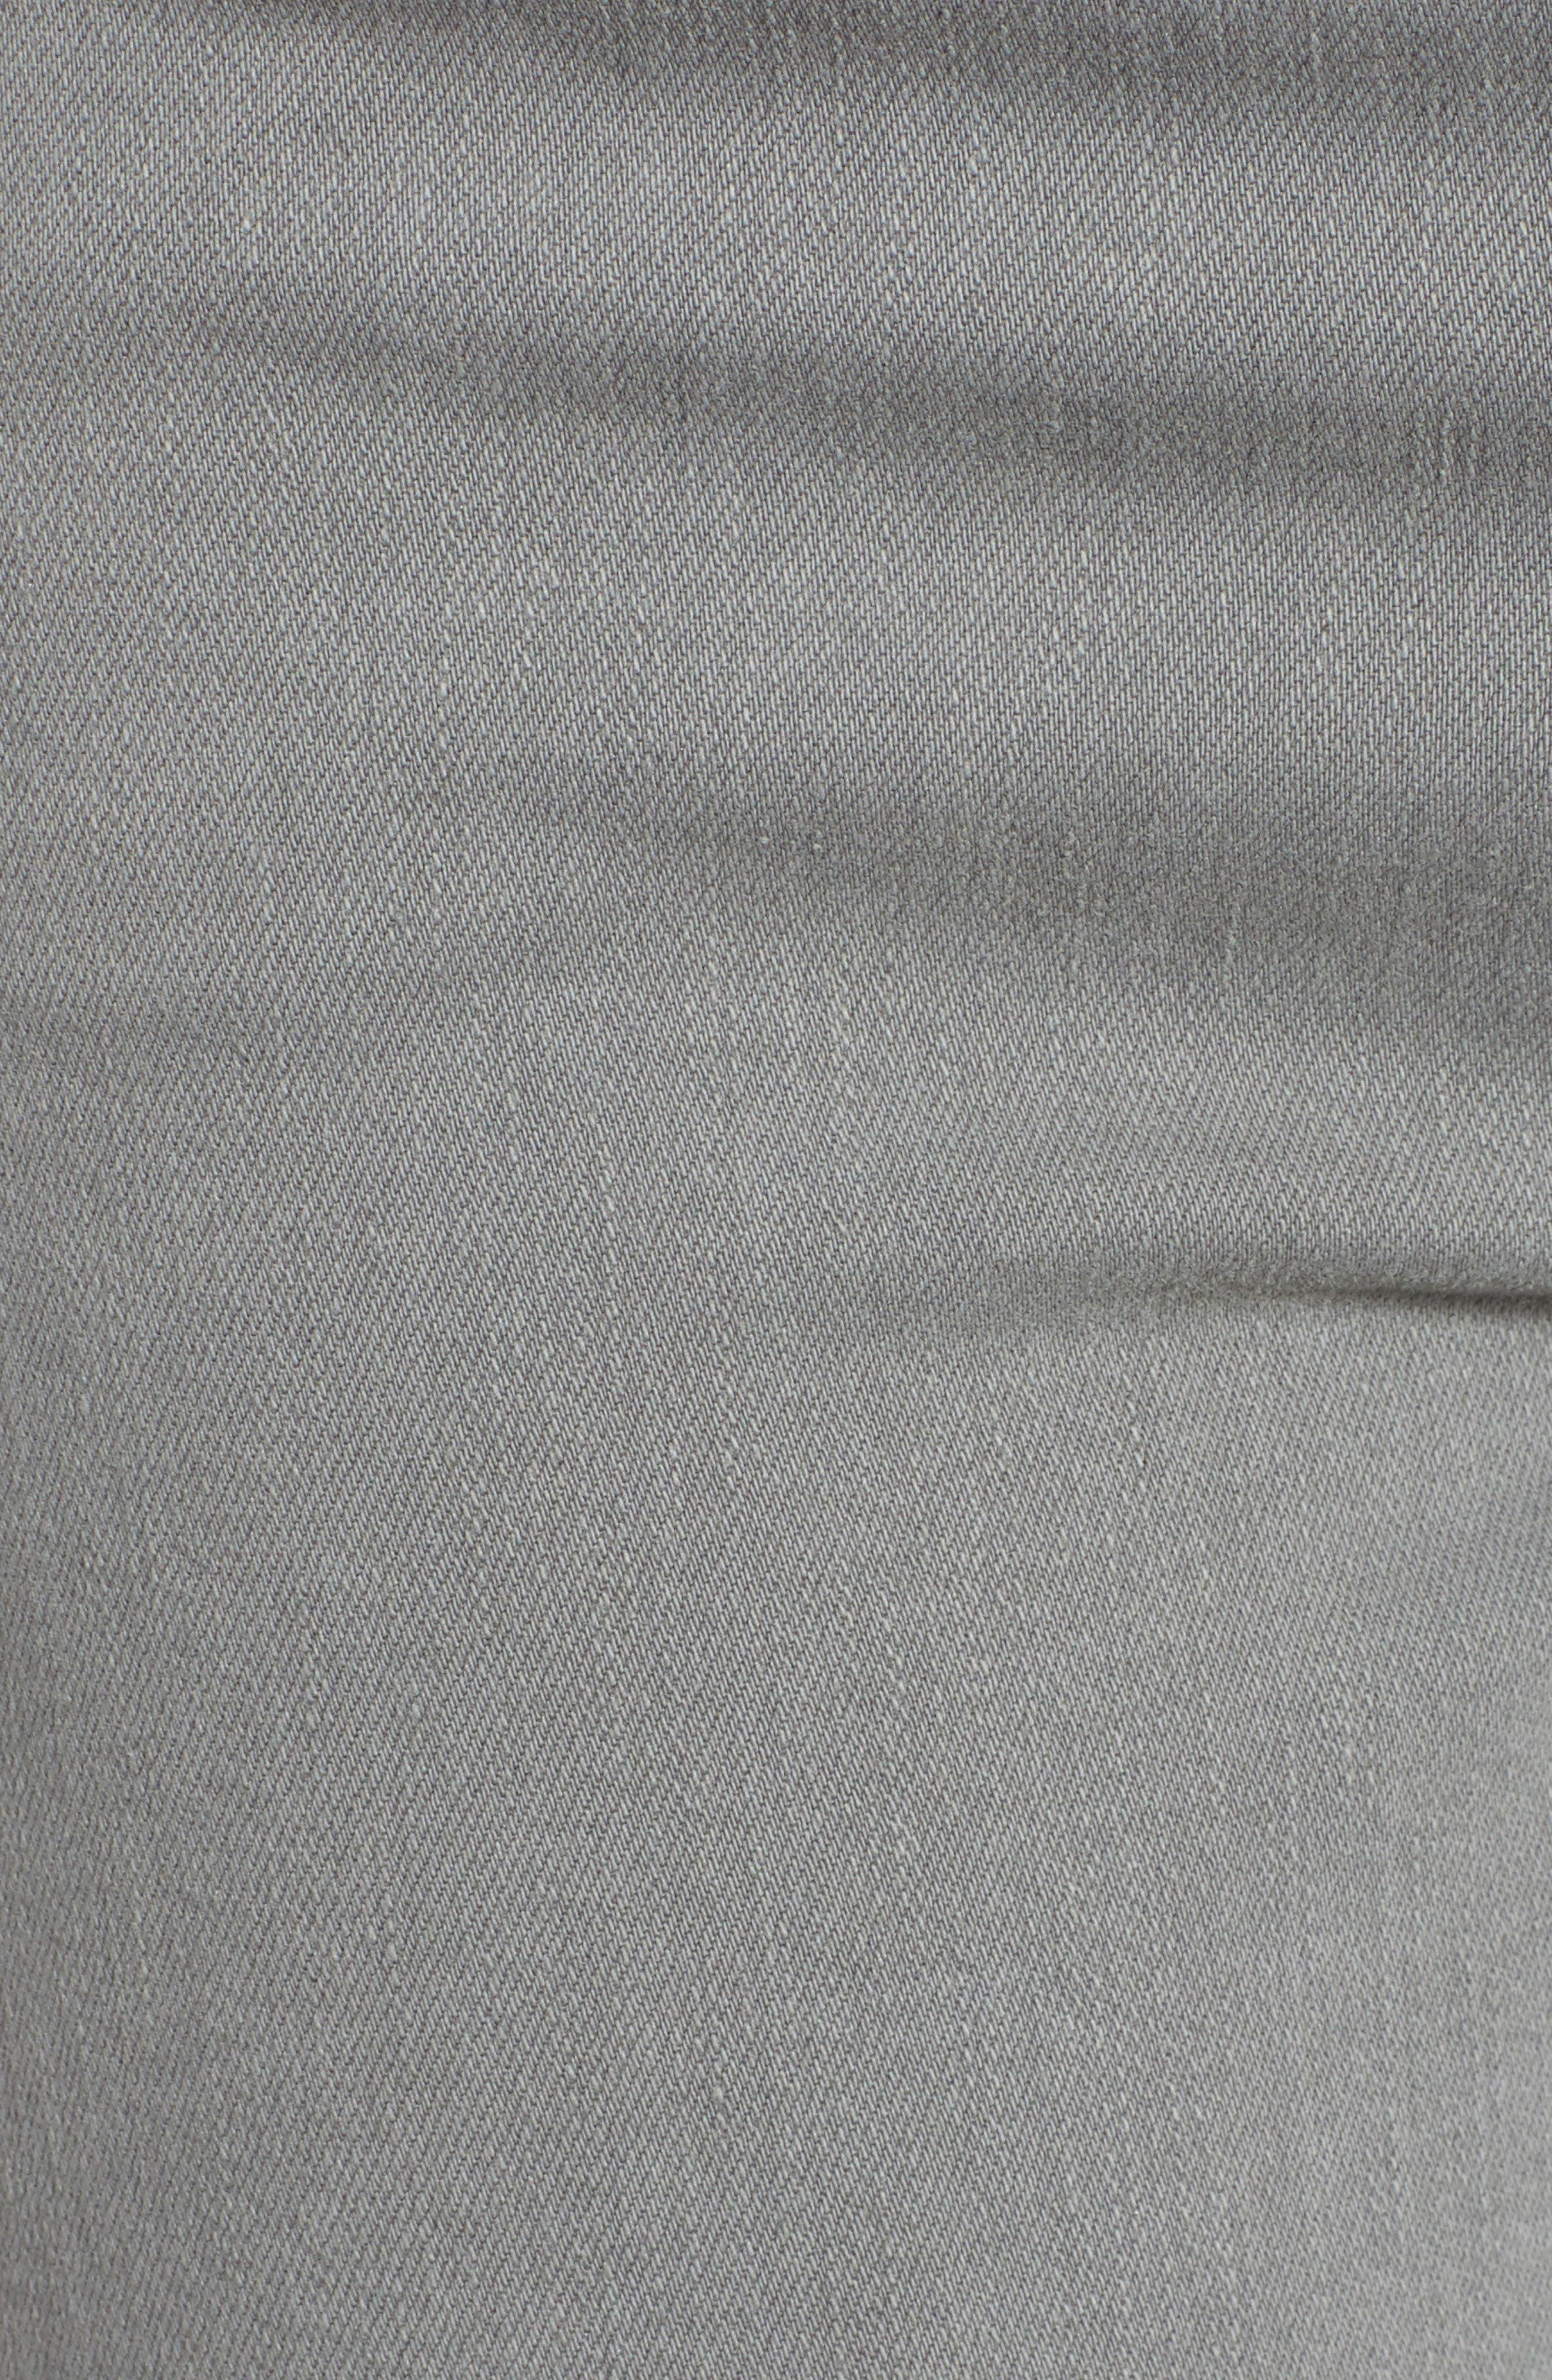 Sierra High Waist Ankle Skinny Pants,                             Alternate thumbnail 6, color,                             GREY